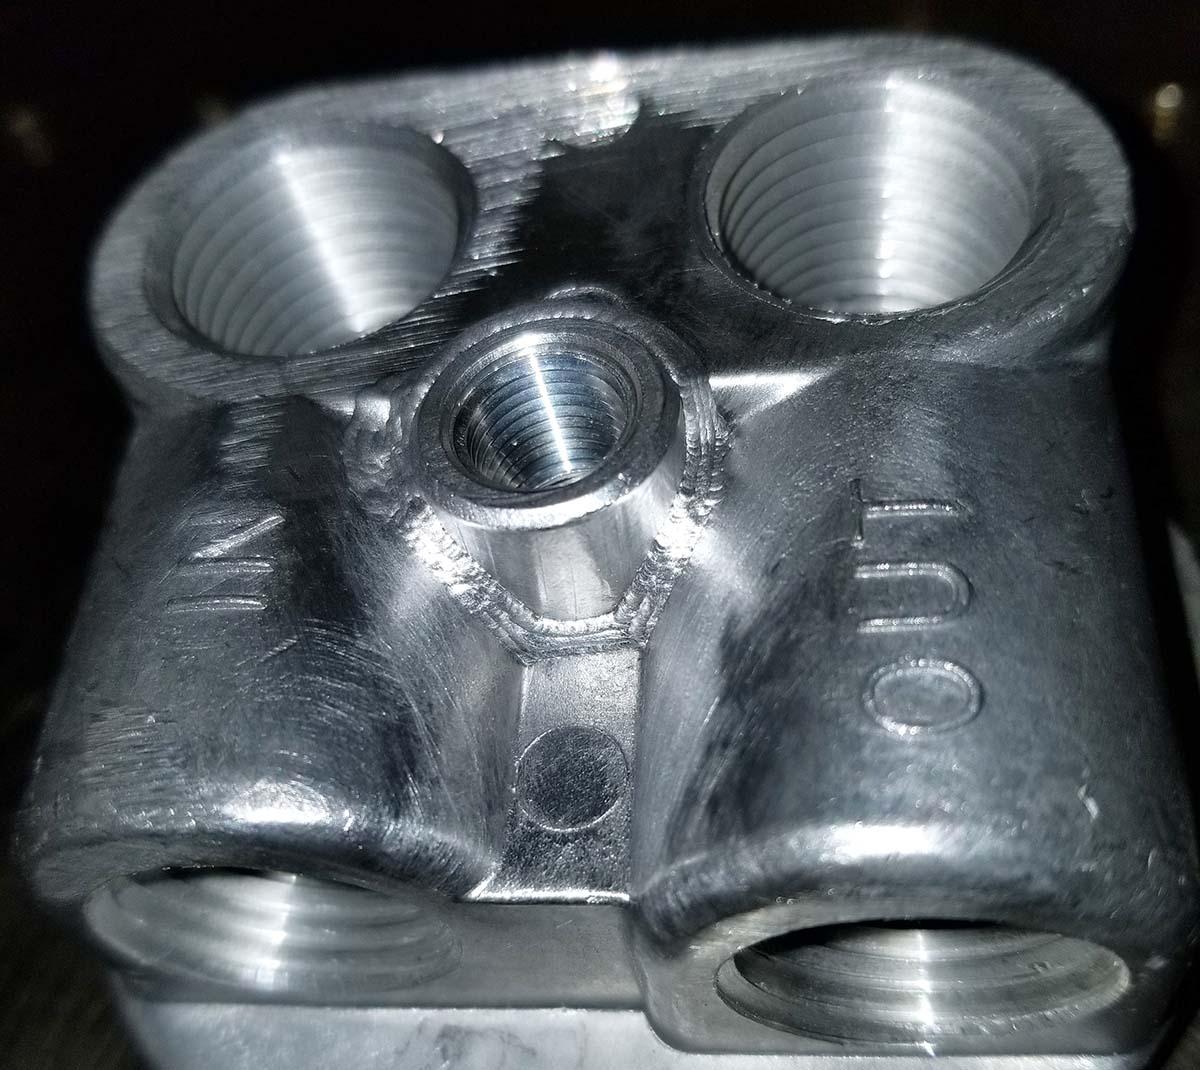 TIG and YAG laser welding, Keller's Fine Line Welding